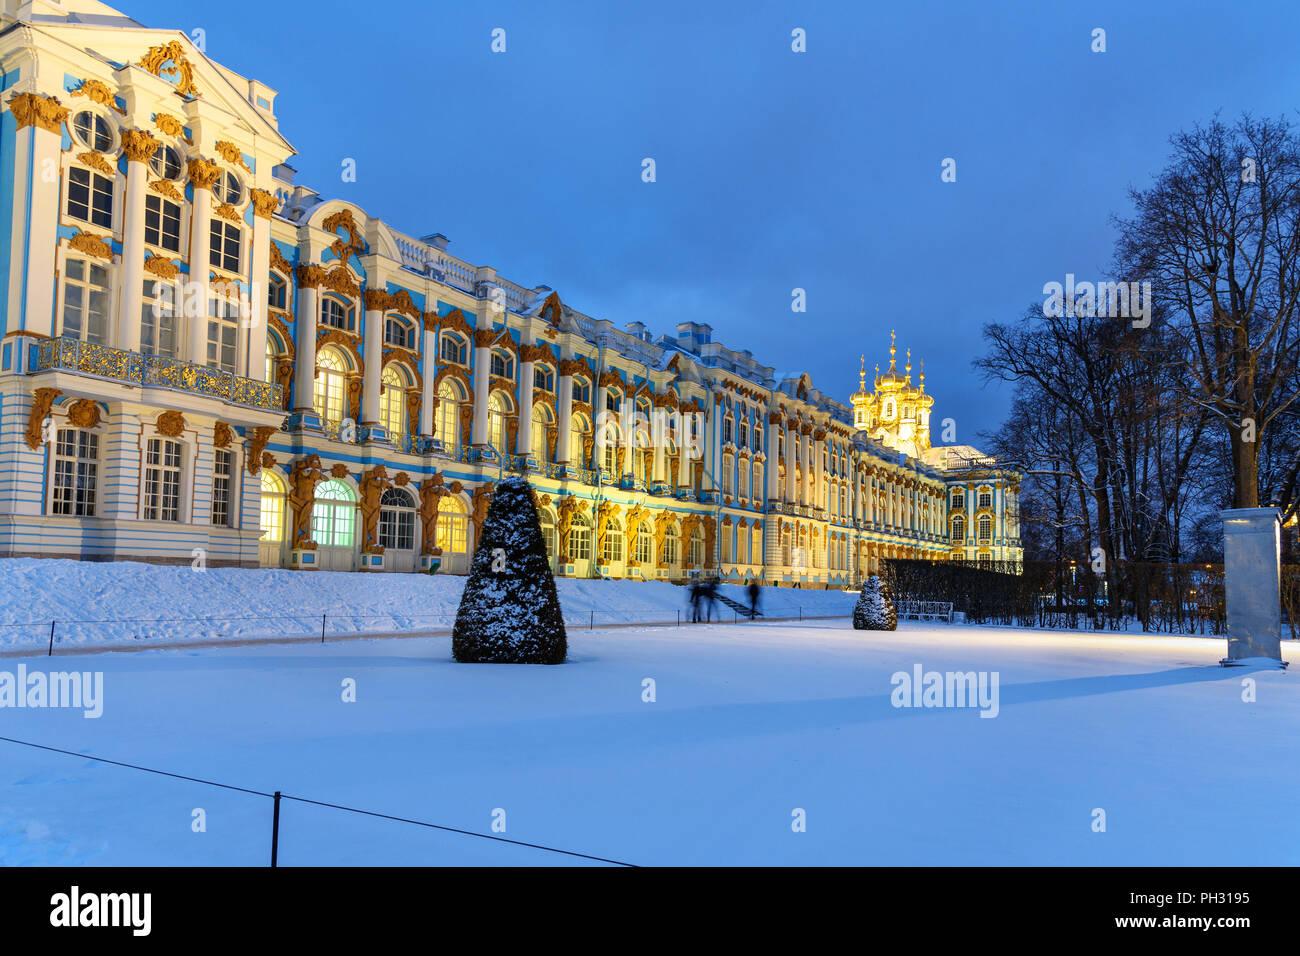 Catherine palace in Tsarskoe Selo at night in winter. Pushkin town. Saint Petersburg. Russia - Stock Image